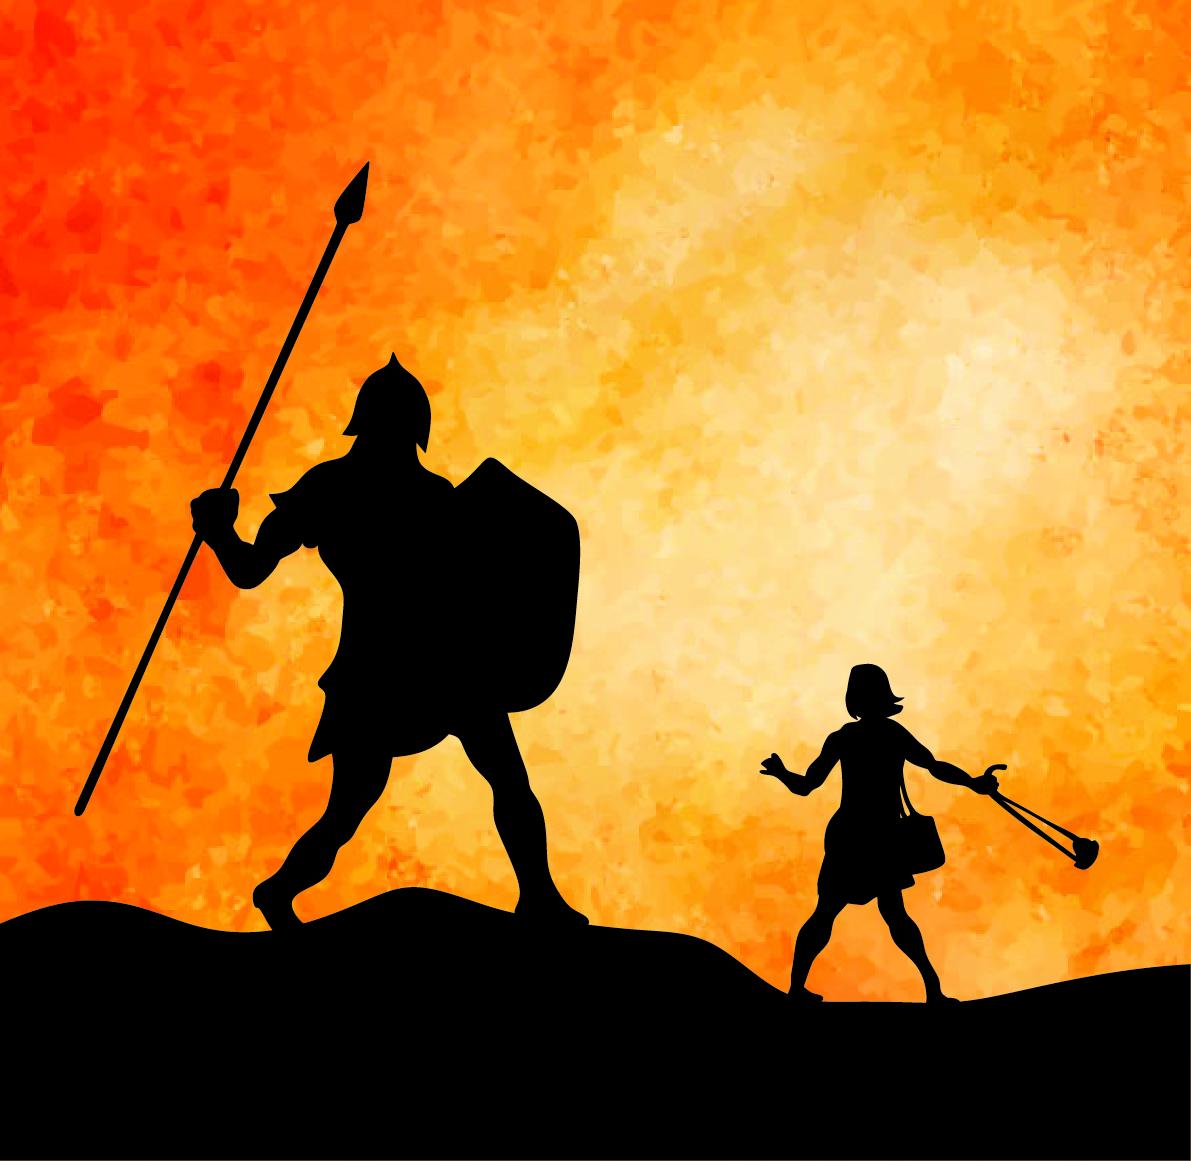 David and Goliath.jpg